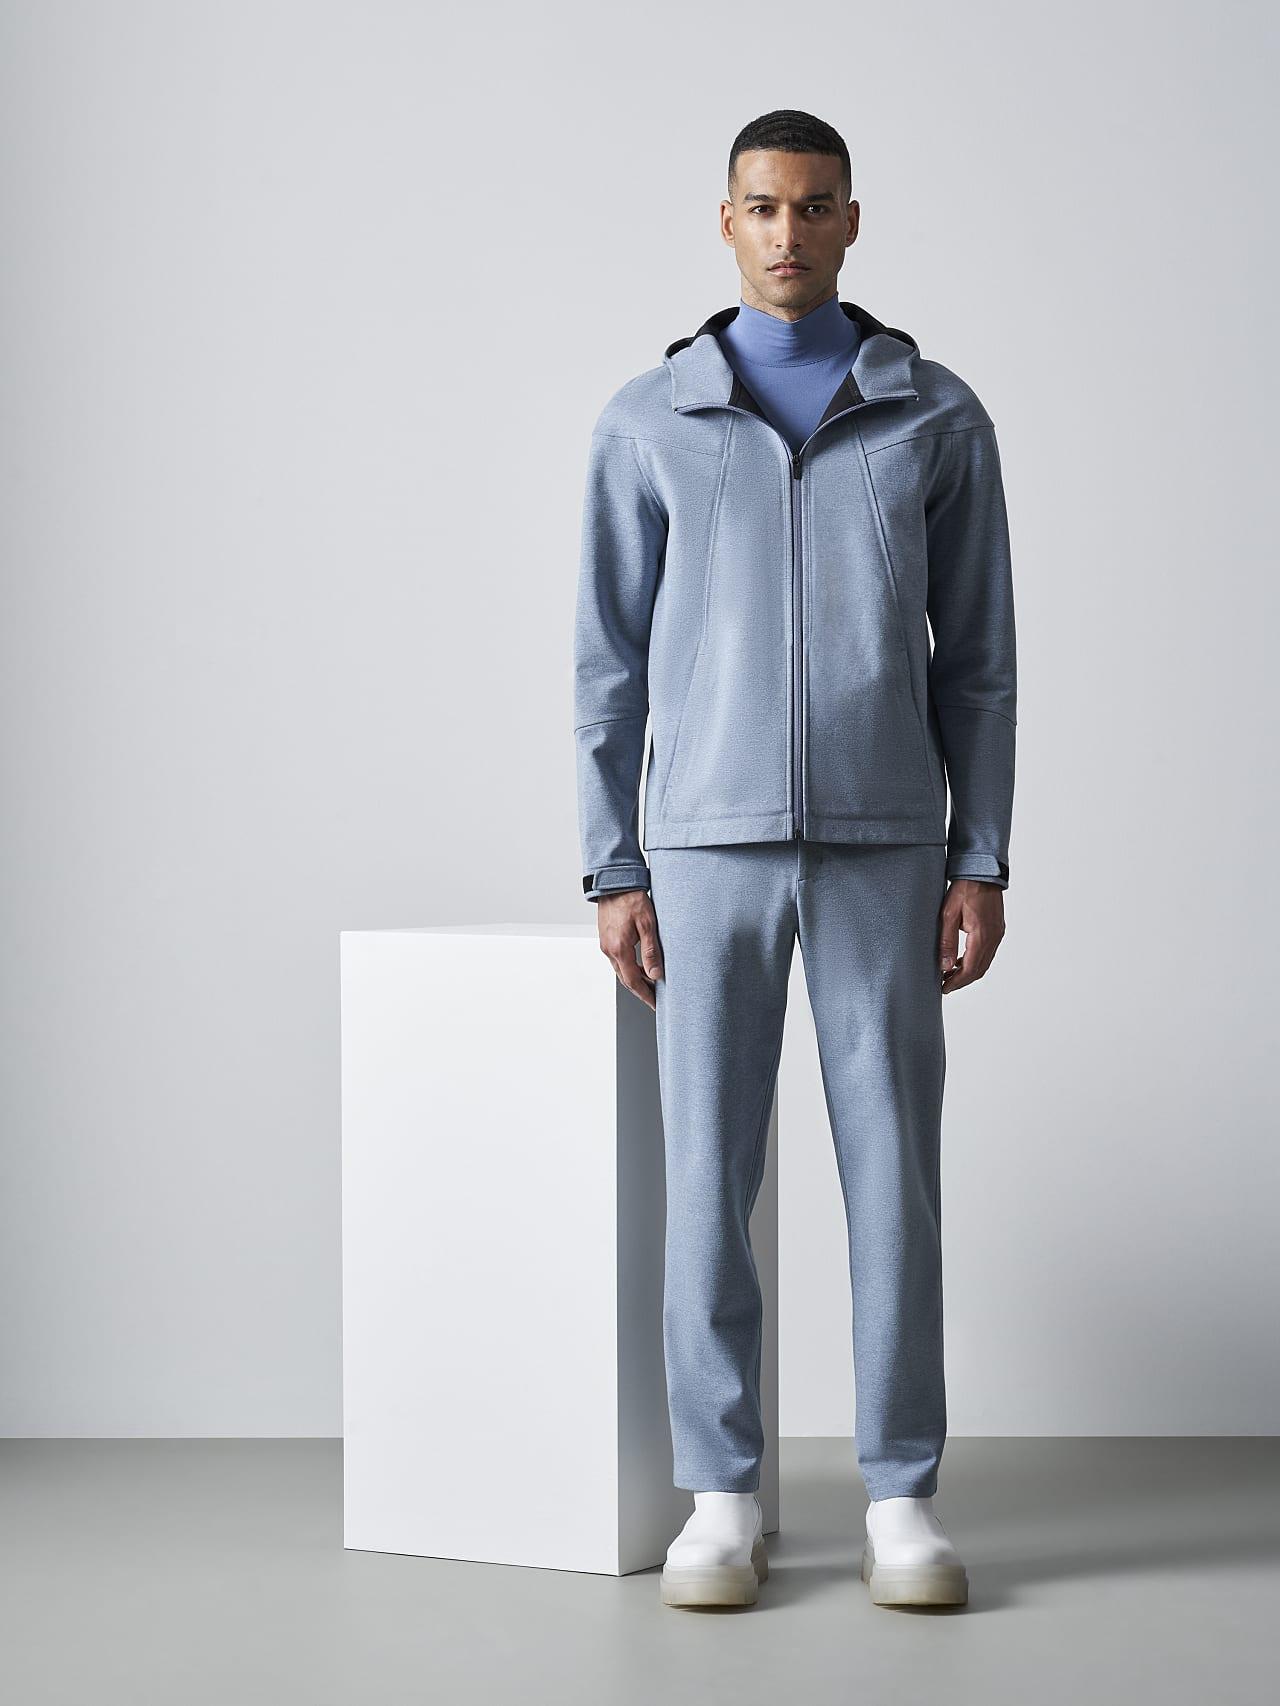 SROTE V1.Y5.02 Waterproof Sweatjacket medium blue Front Alpha Tauri